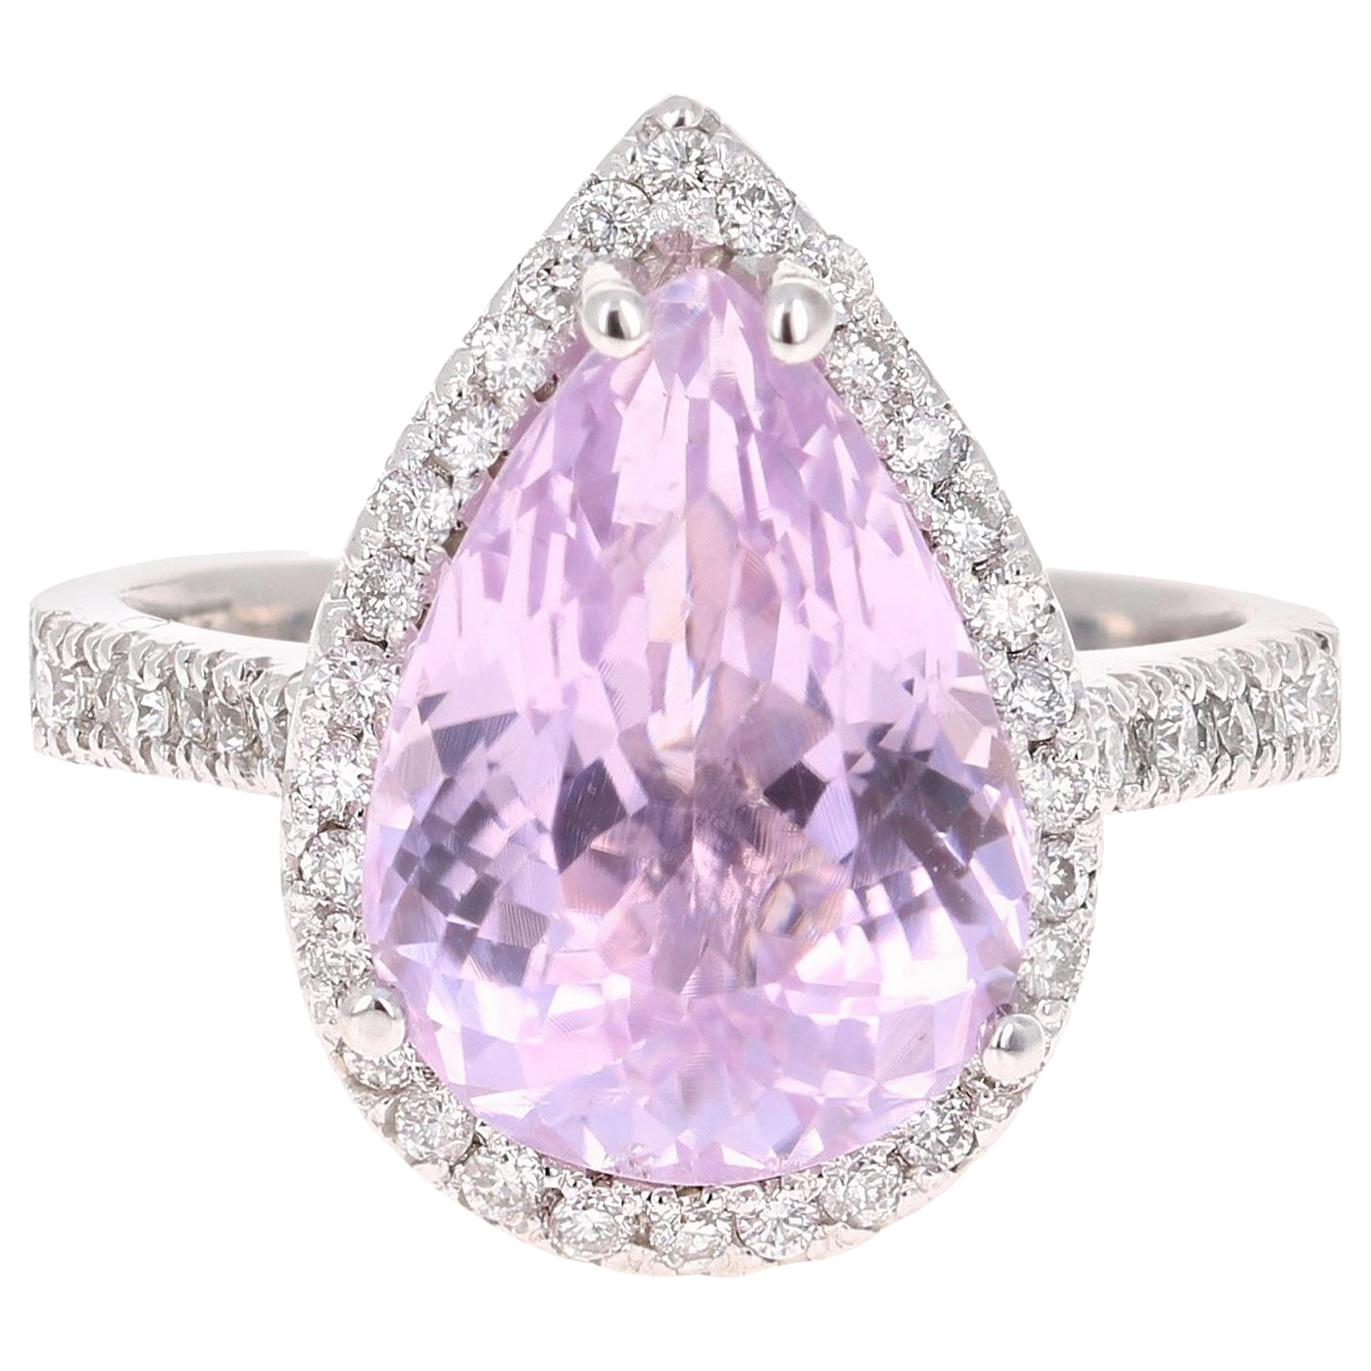 7.04 Carat Kunzite Diamond White Gold Engagement Ring